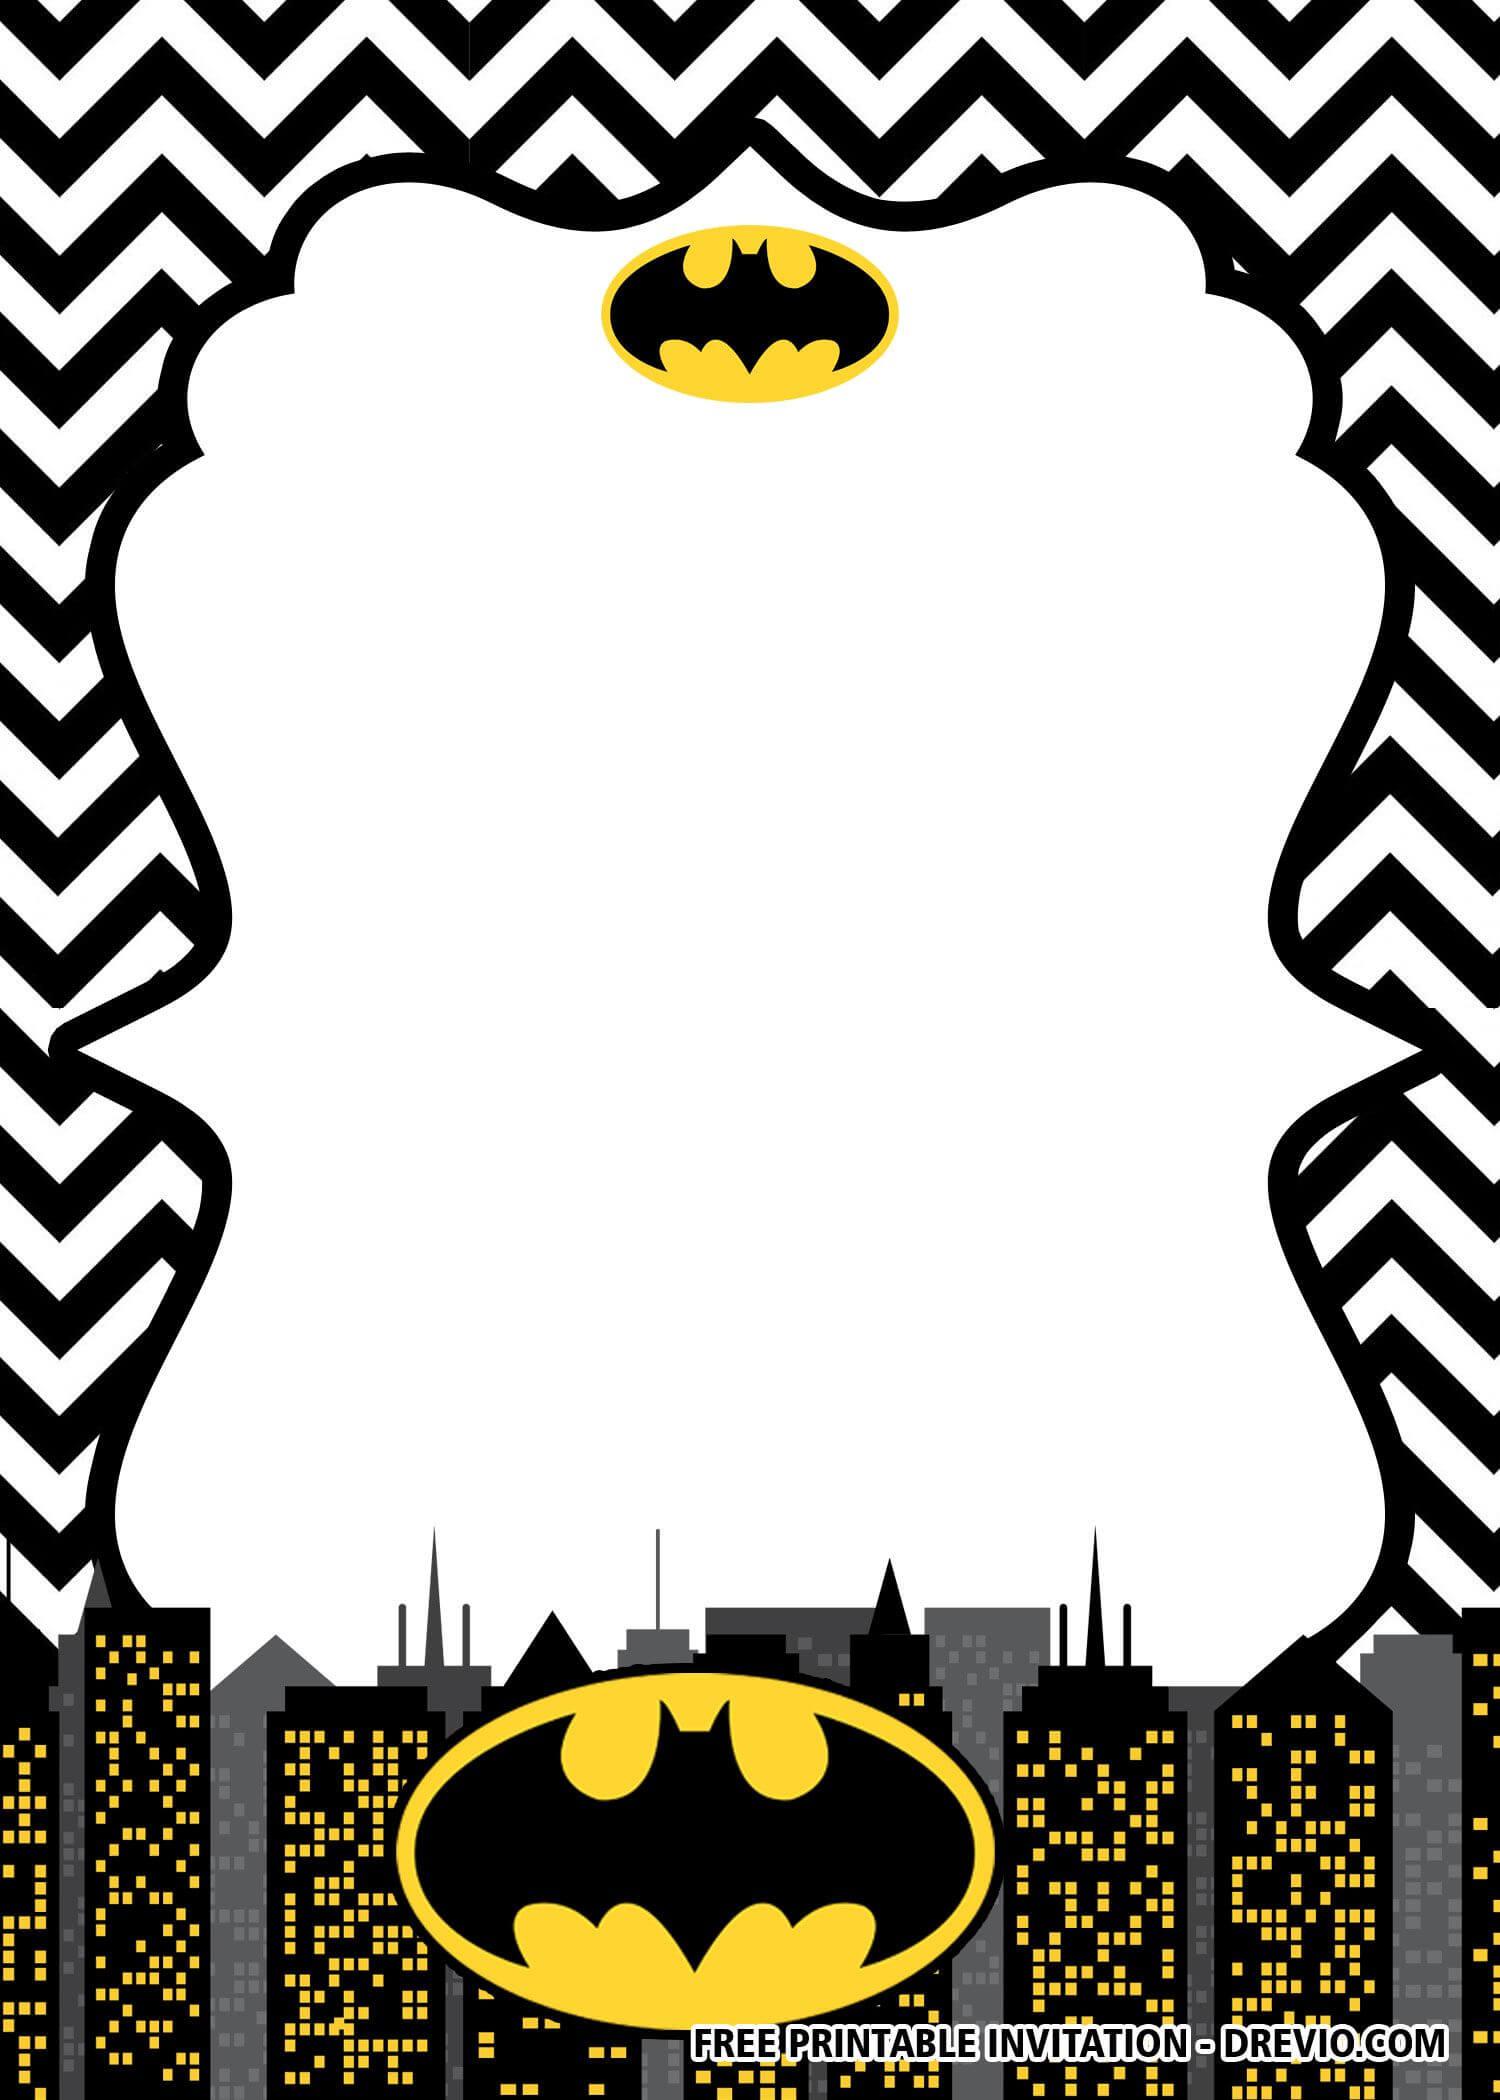 Free Printable Batman Birthday Invitation Templates | Batman Inside Batman Birthday Card Template